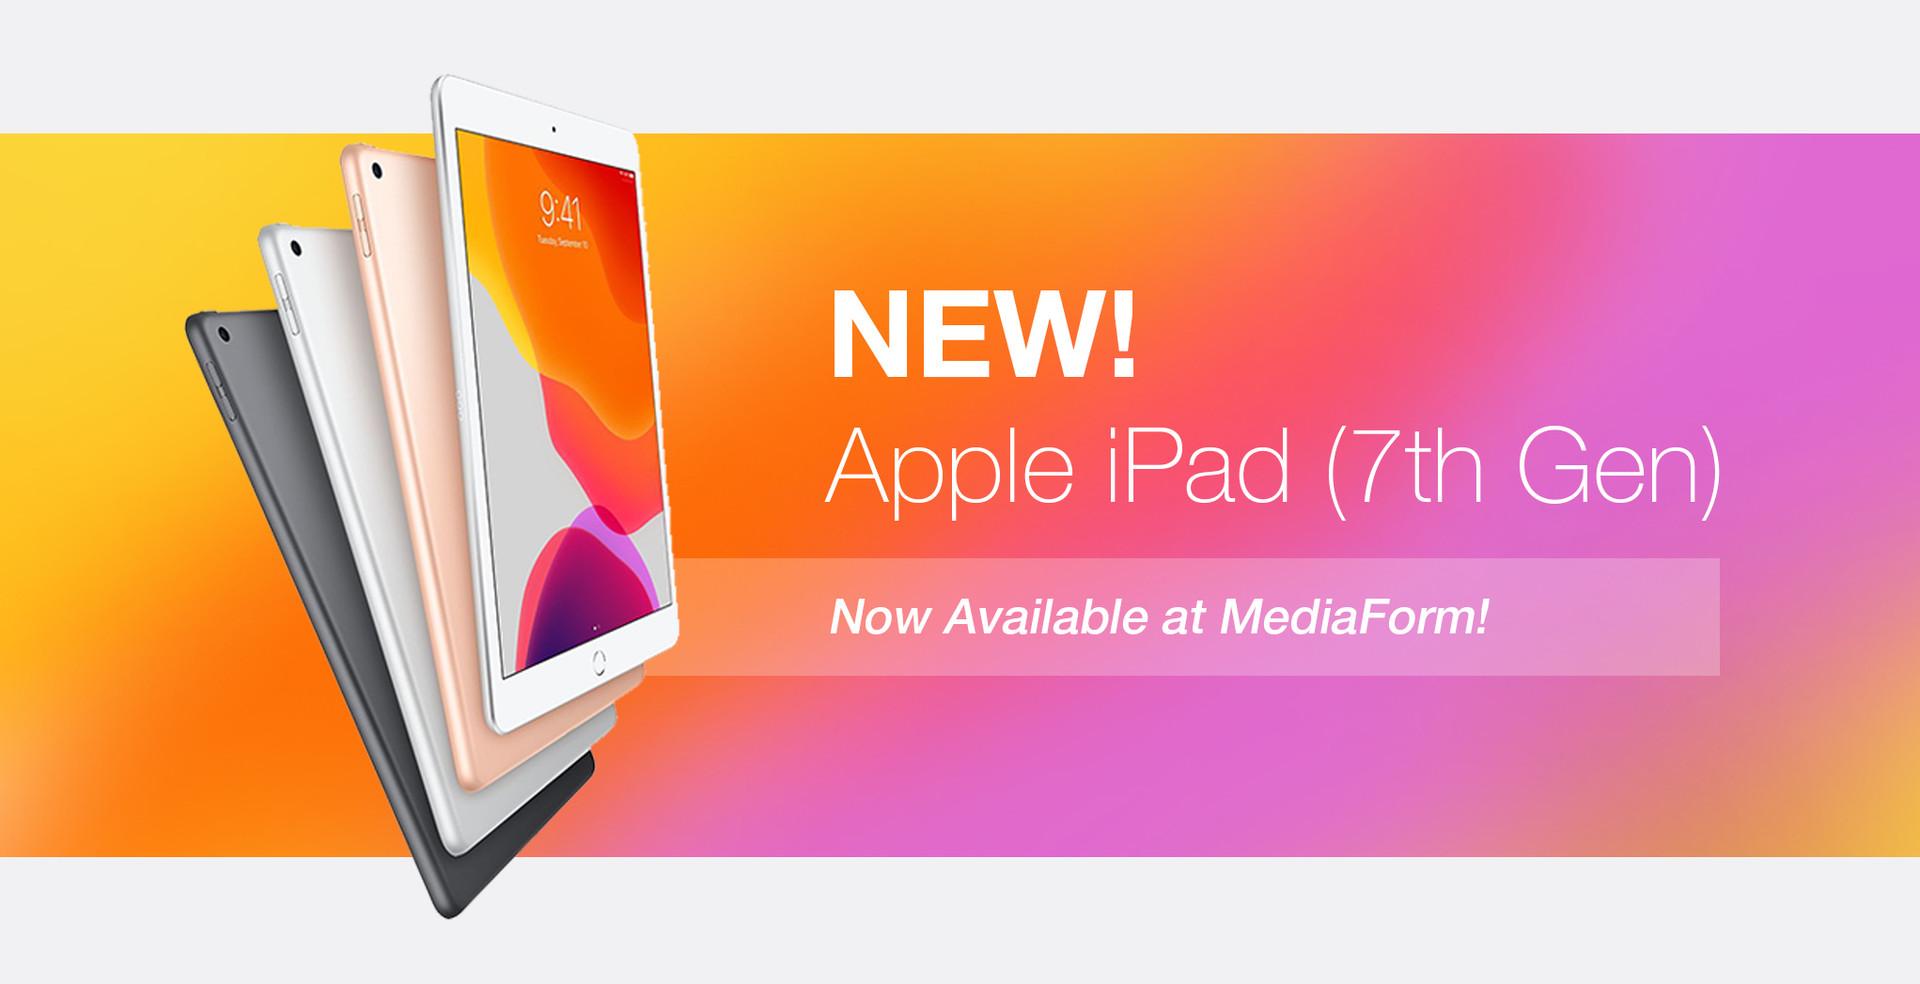 New! Apple iPad (7th Gen)